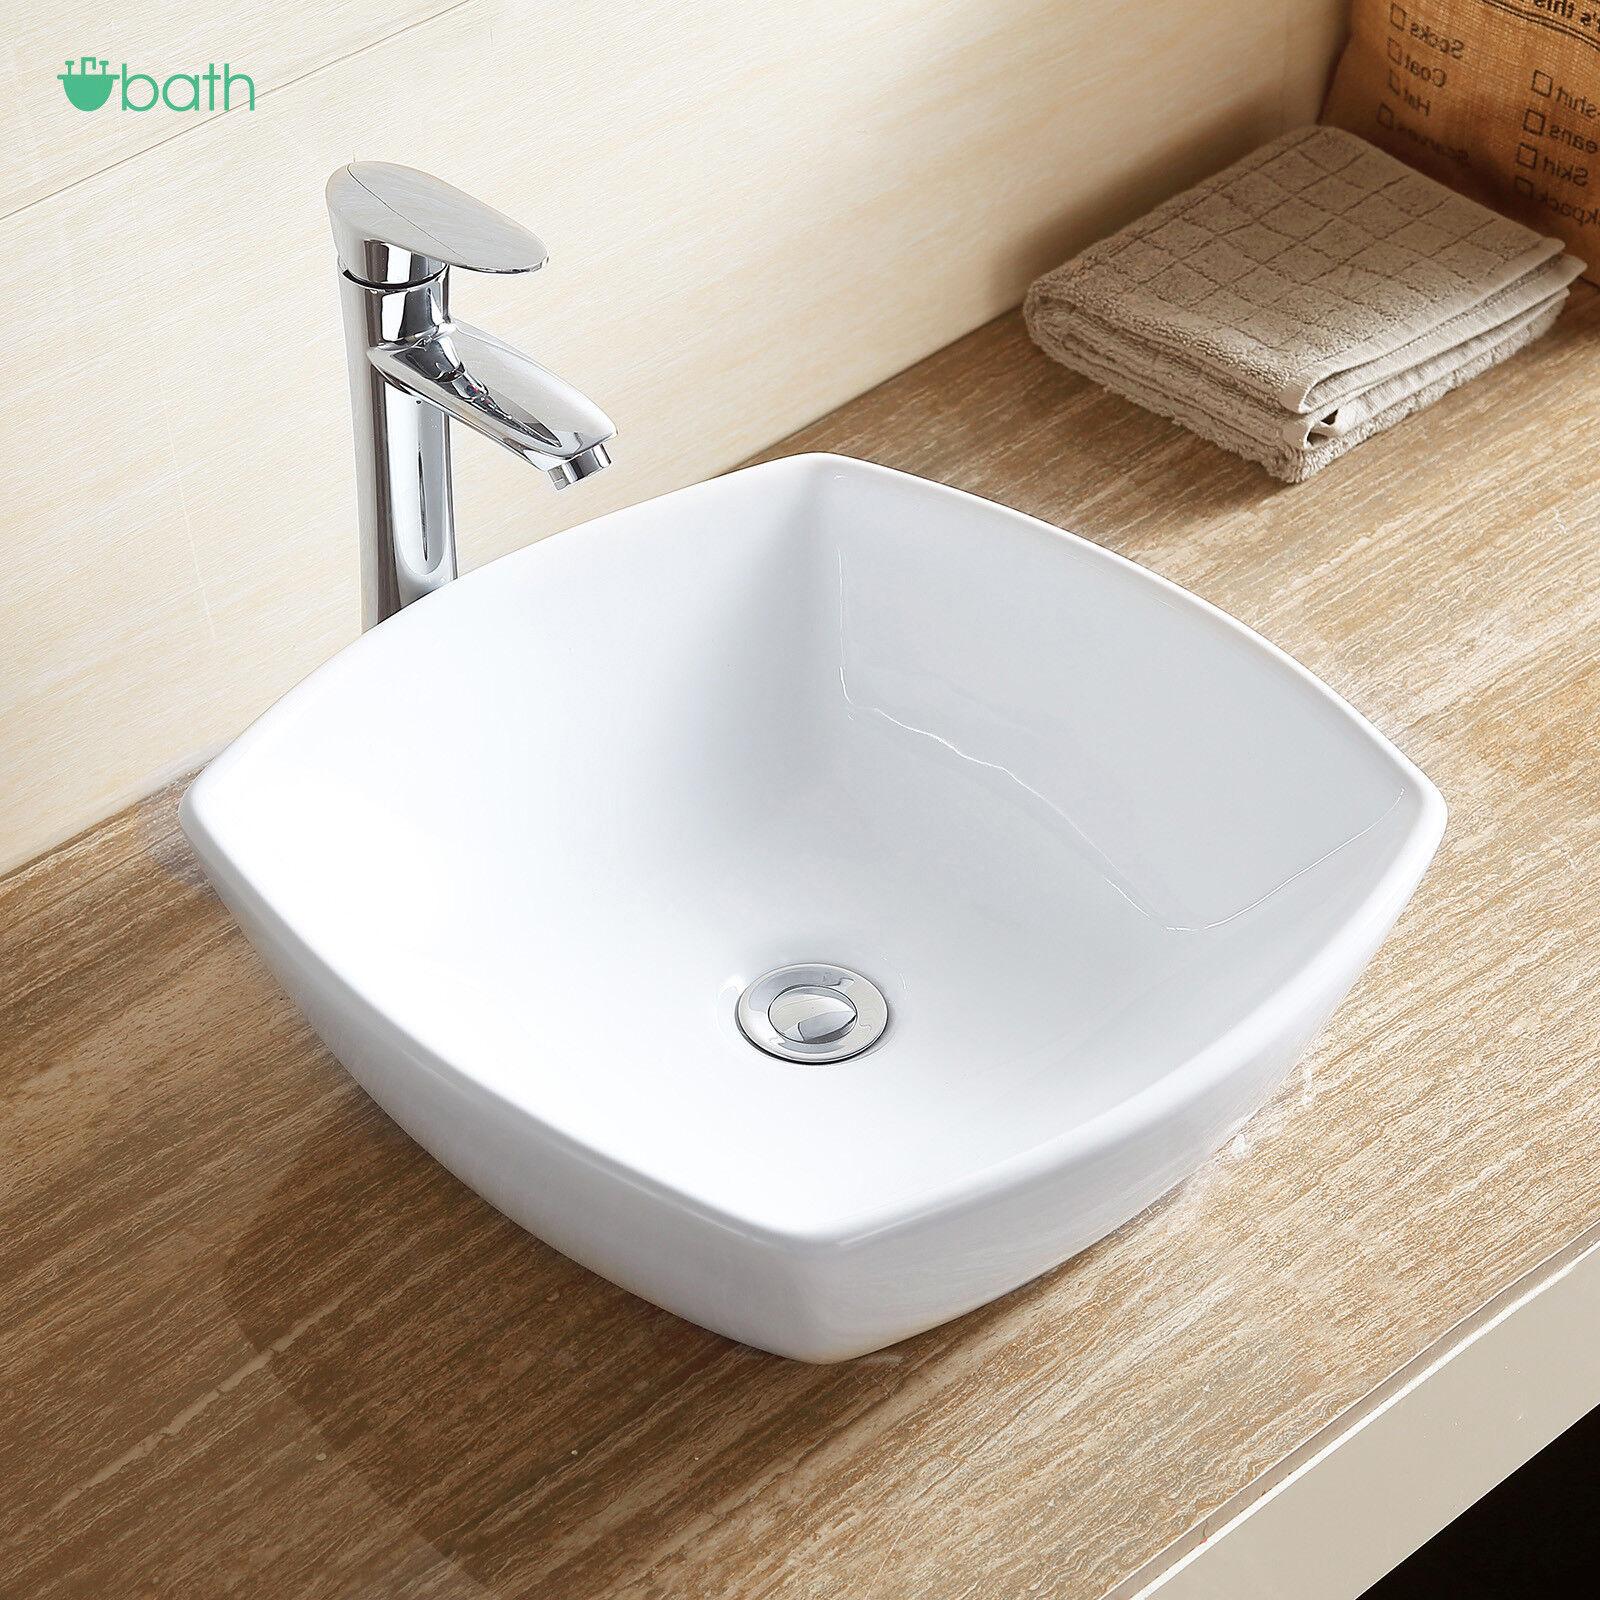 Bathroom White Ceramic Sink Porcelain Vessel Vanity Bowl Basin Pop Up Drain